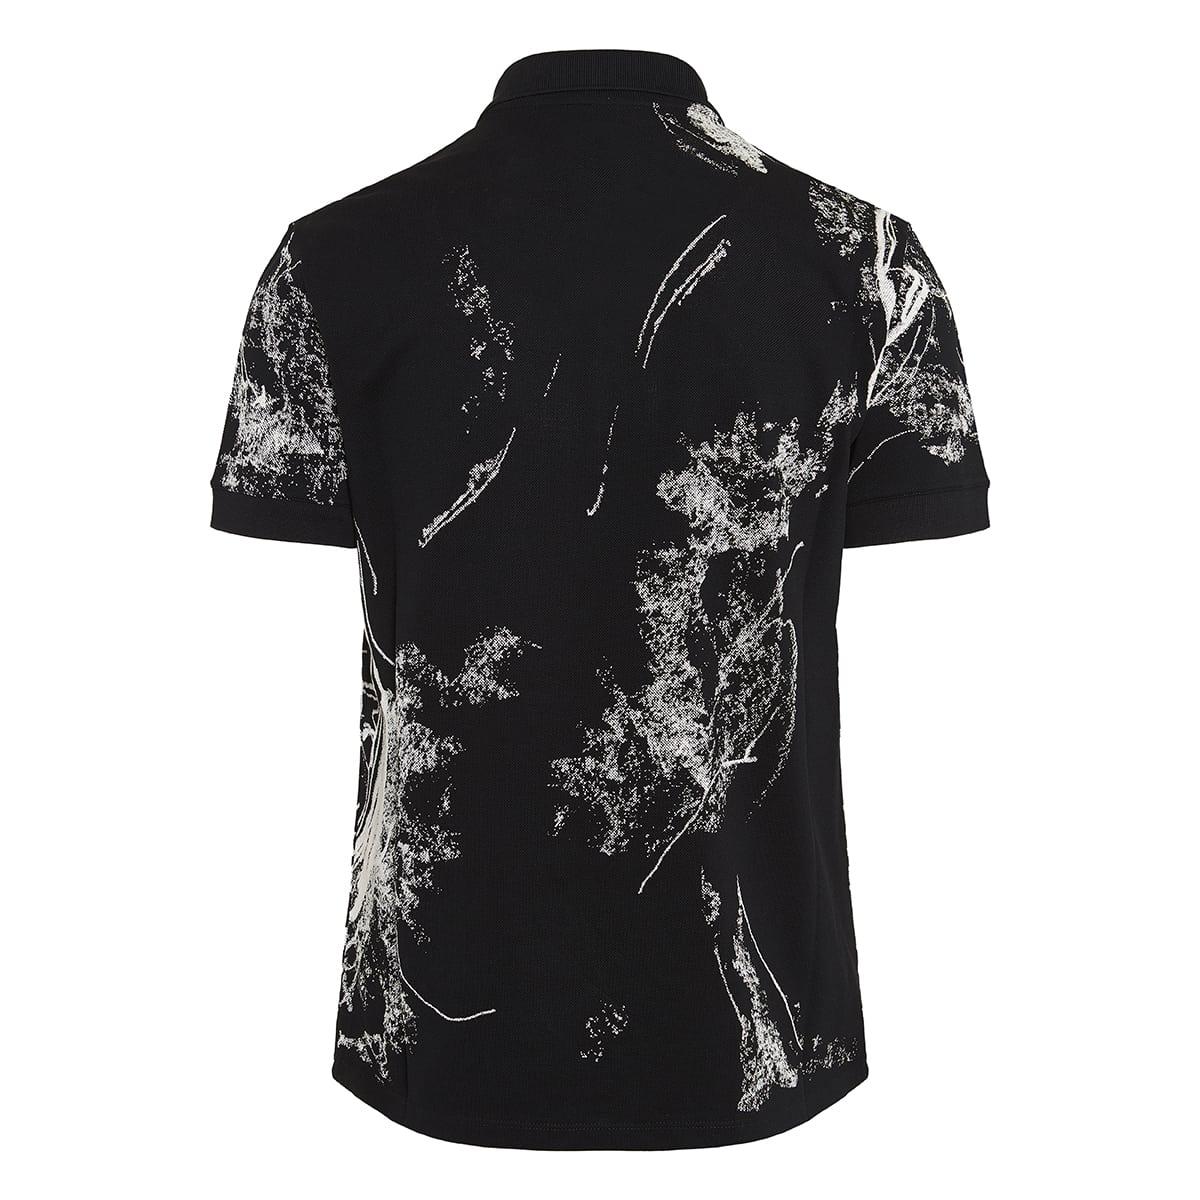 Skulls graphic polo shirt